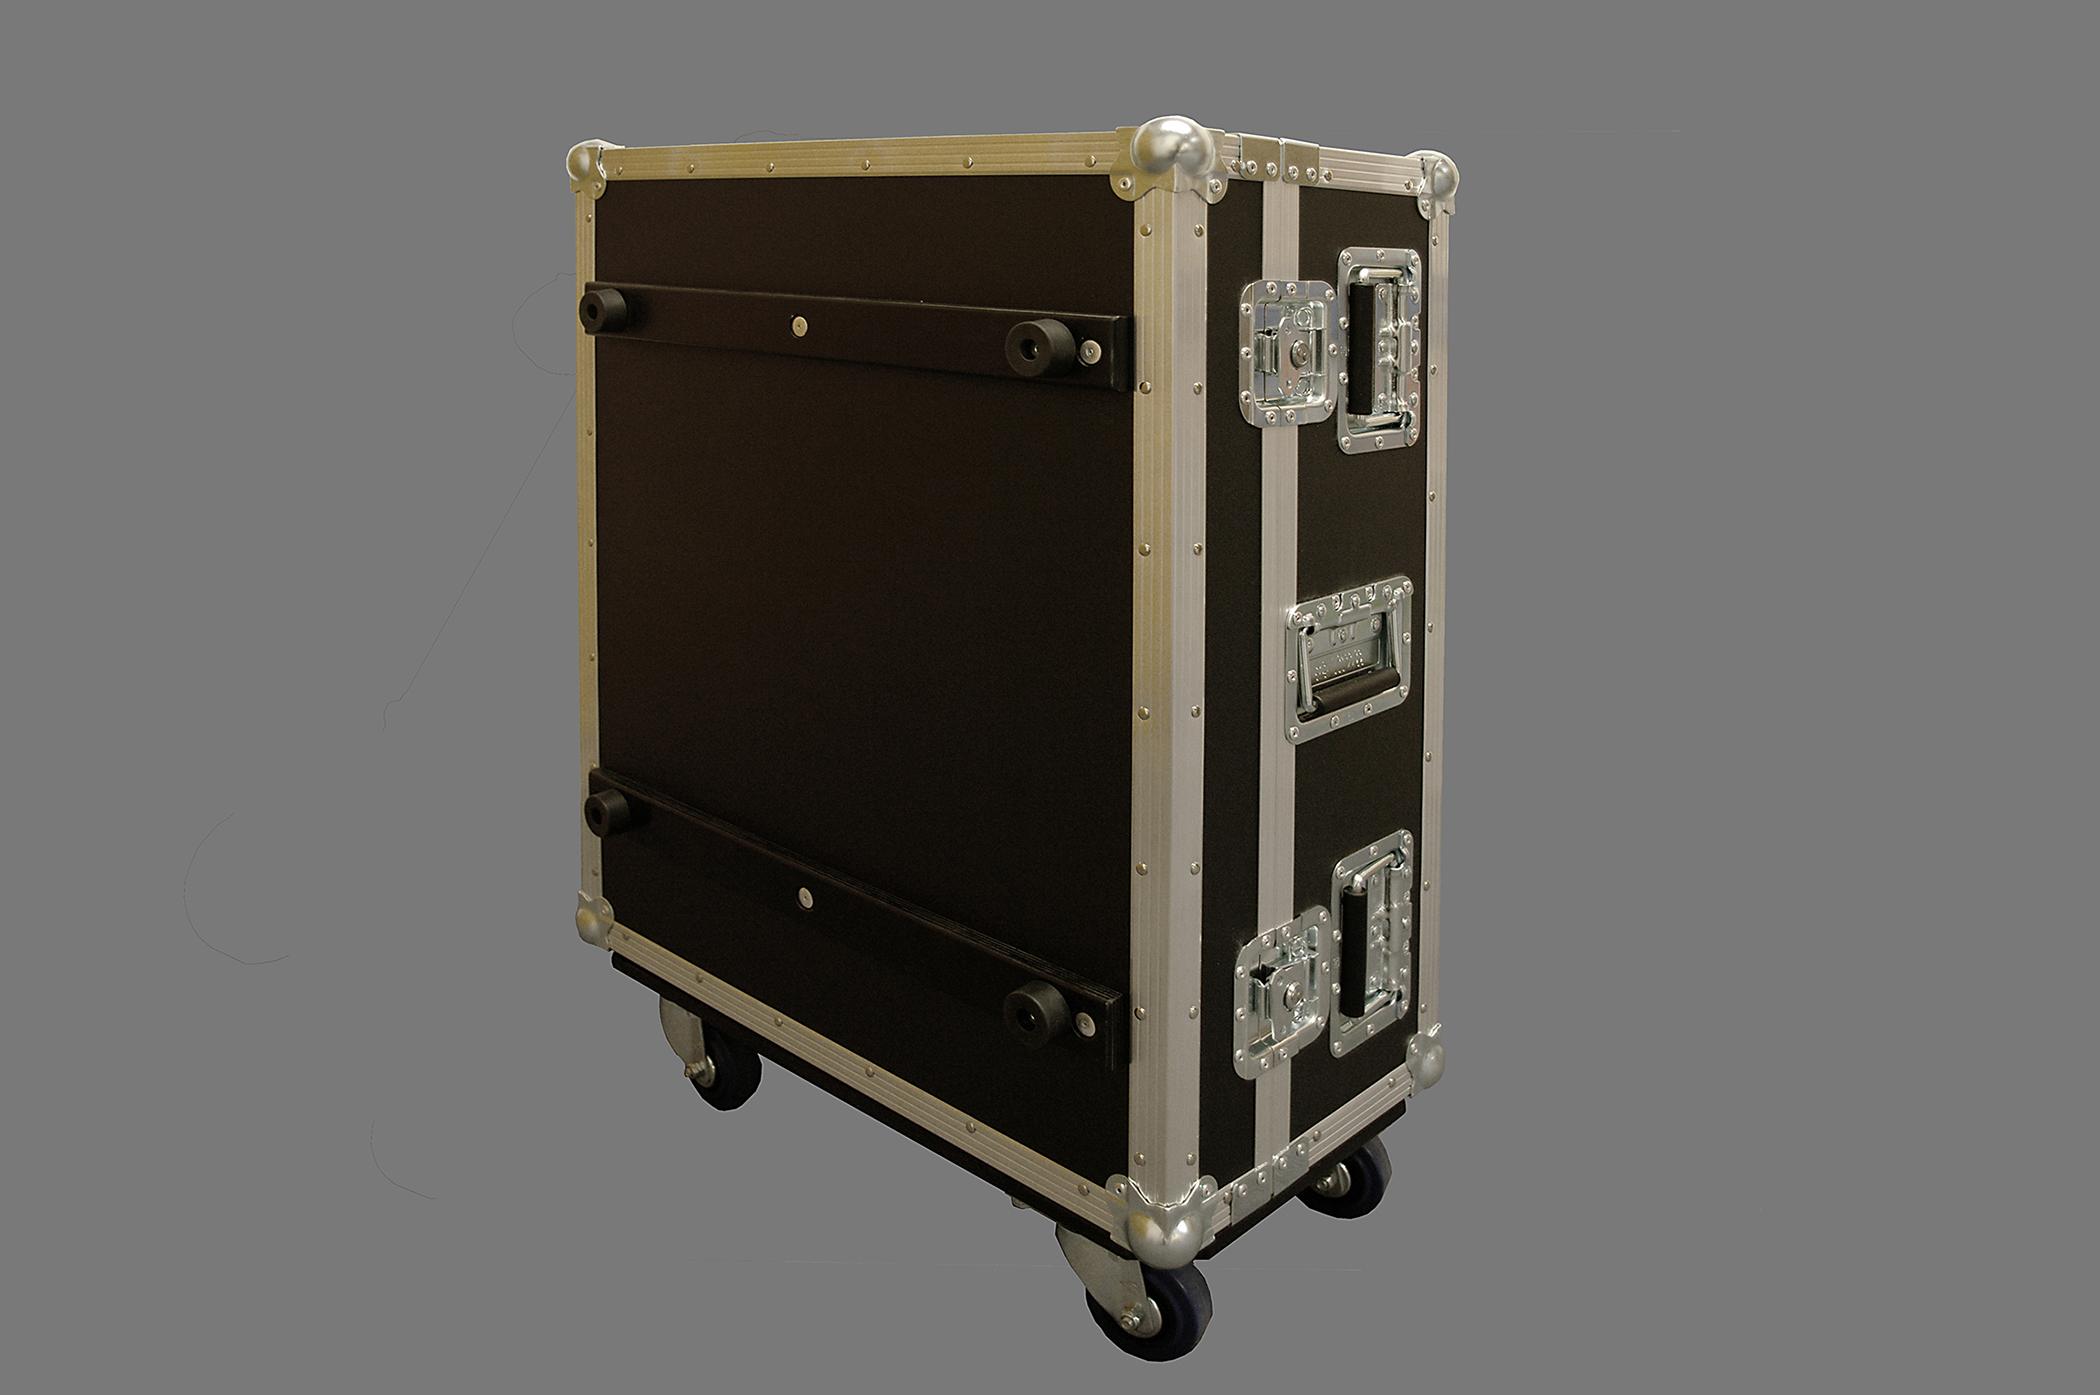 Panasonic projector case_03